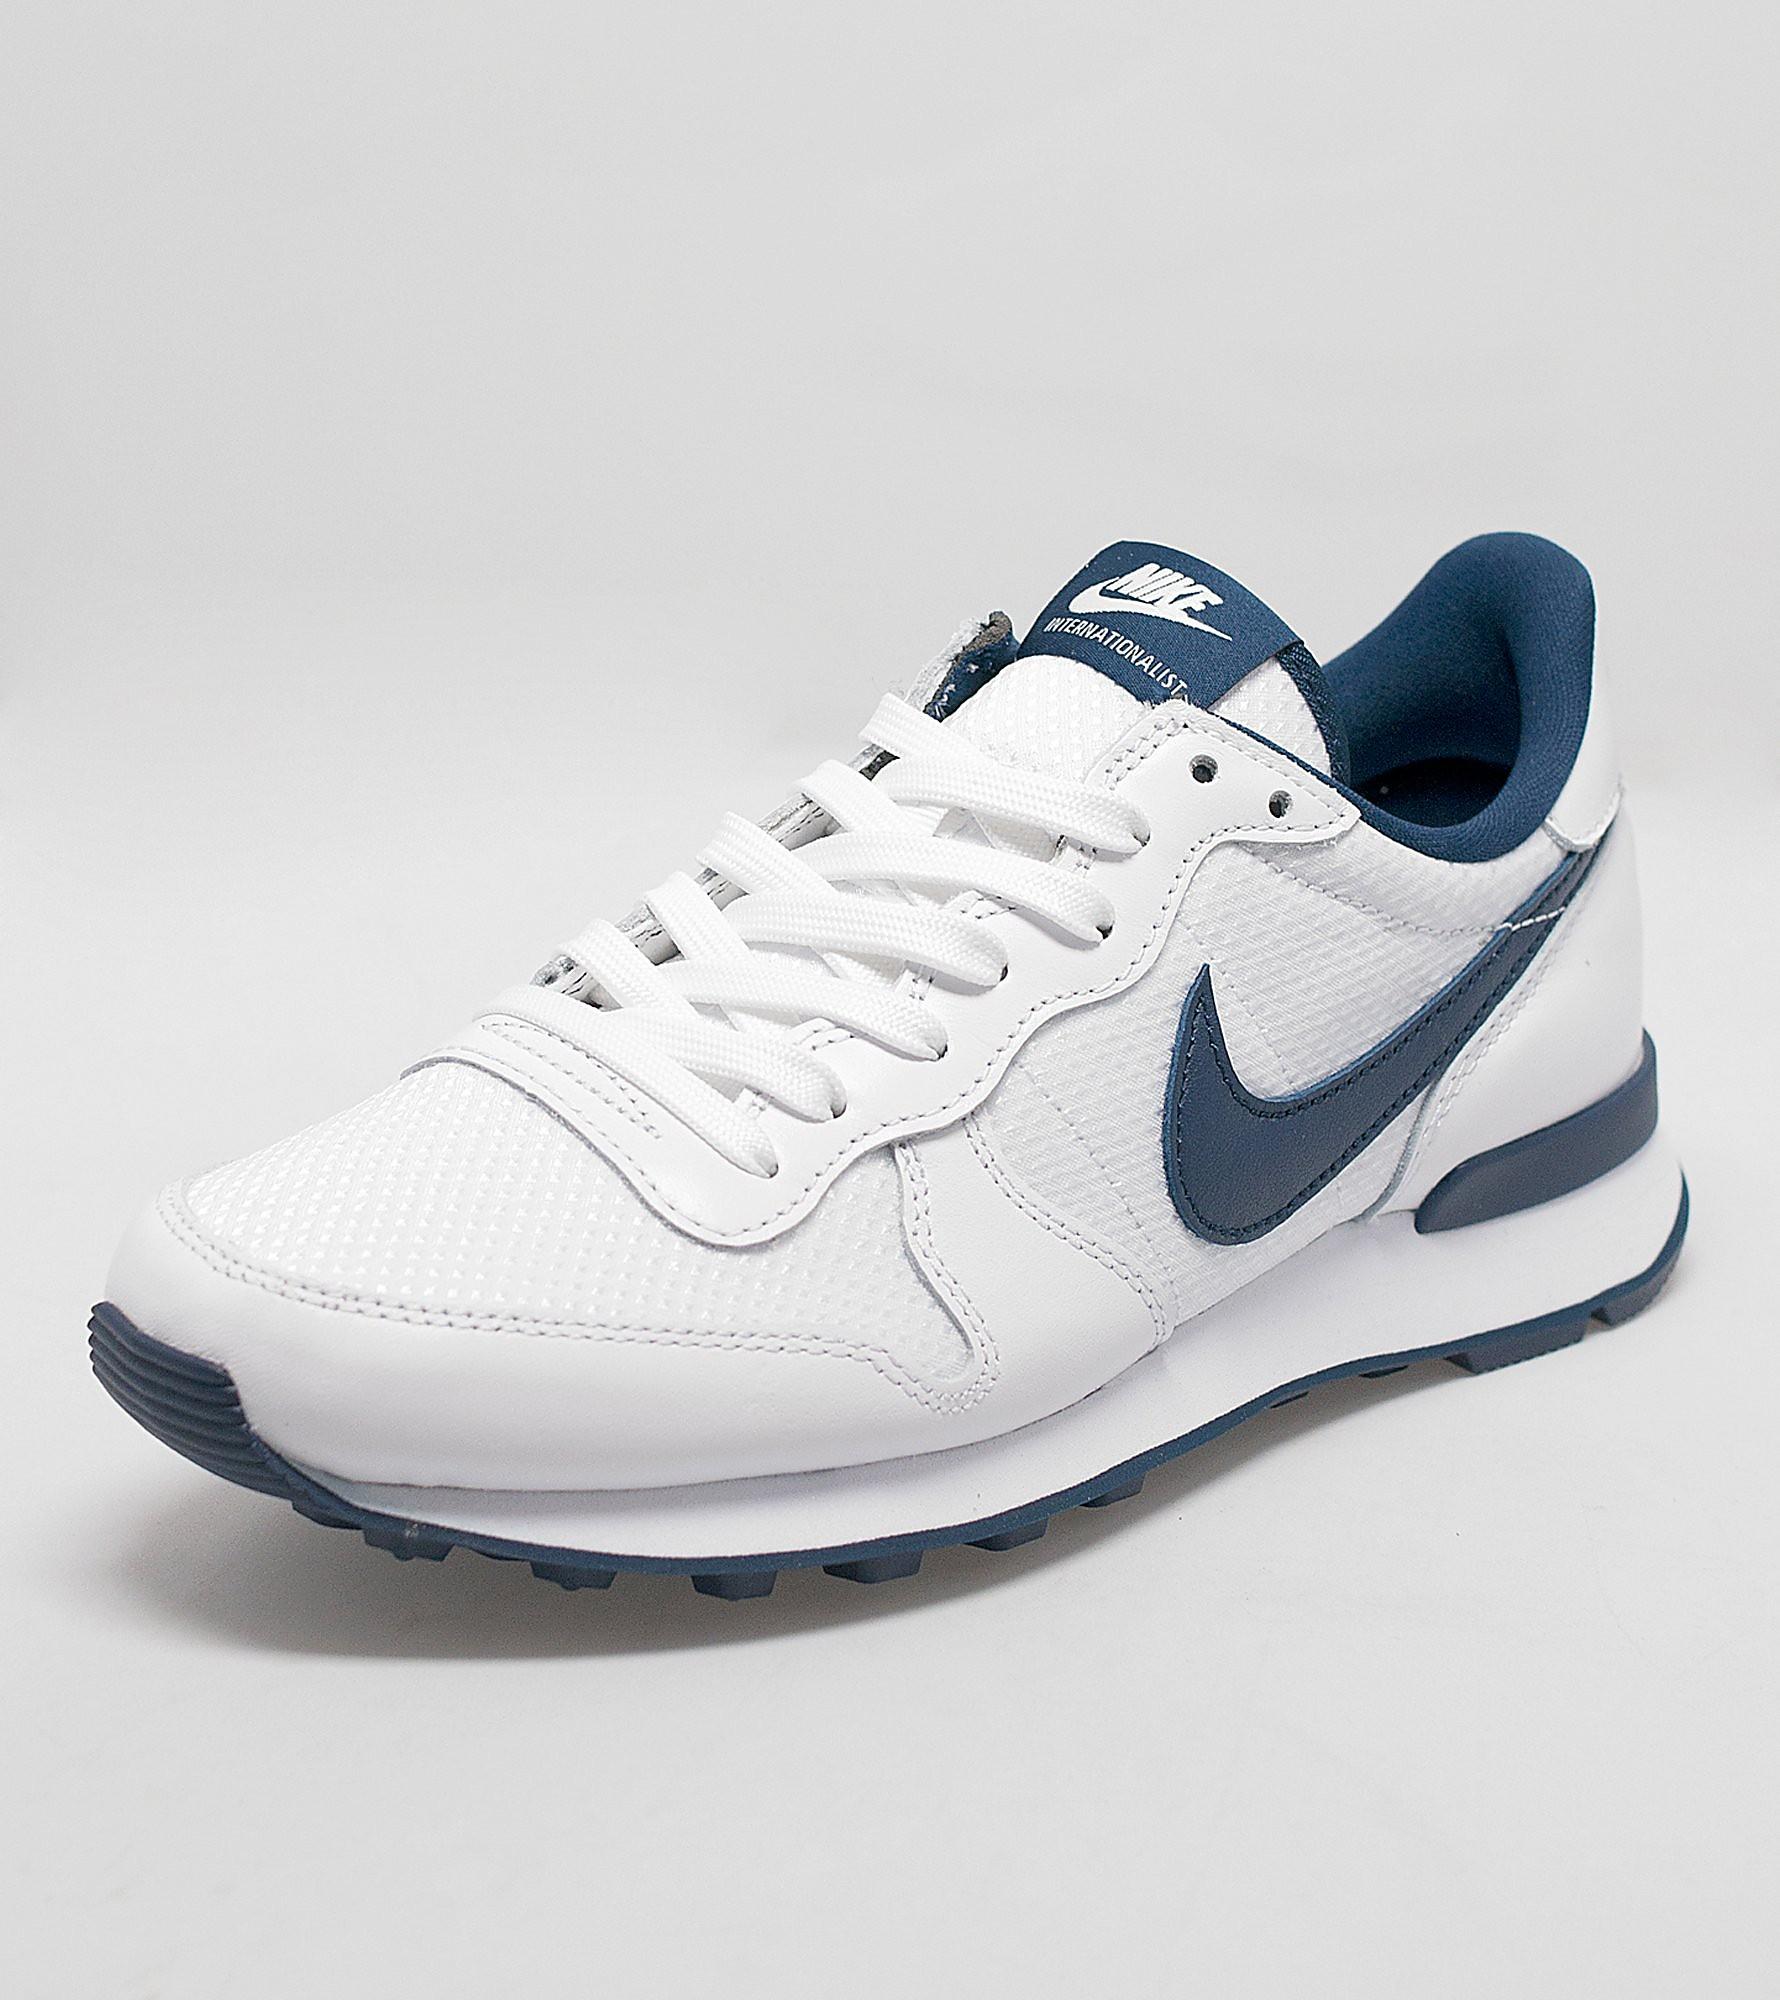 Nike Internationalist FO QS Women's